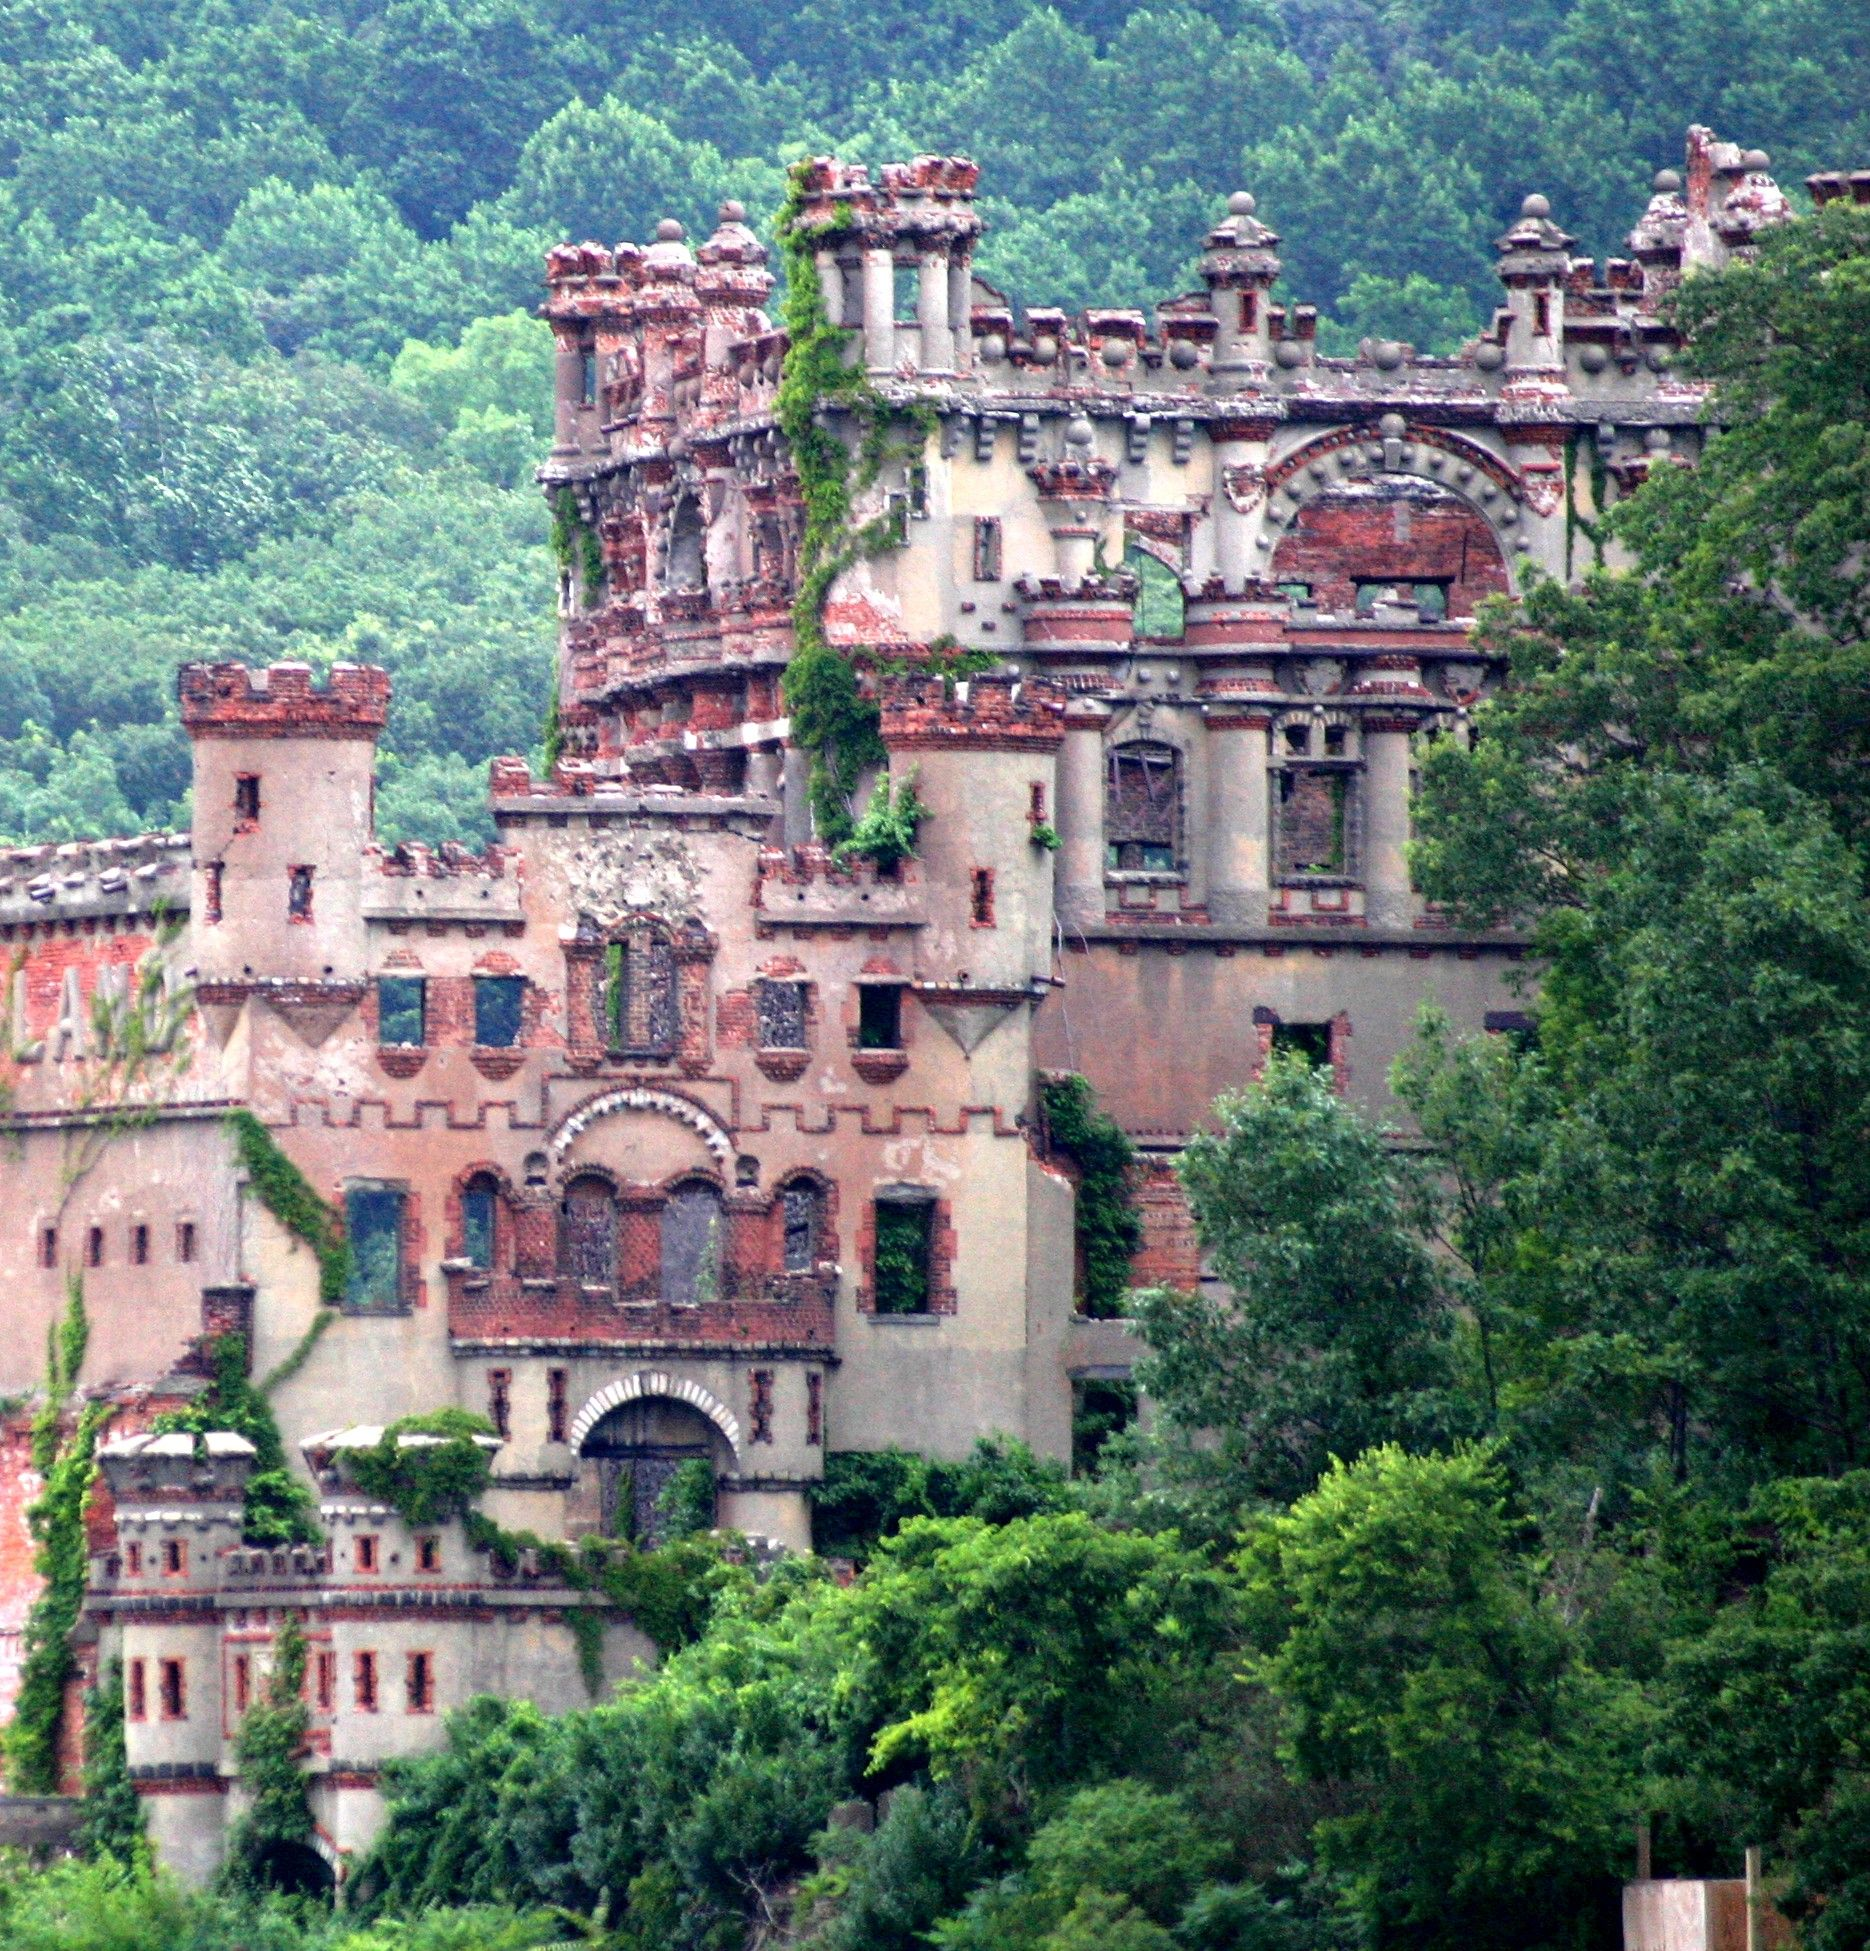 Beautiful Places Hudson Valley: Bannermans Castle (Hudson River Valley)